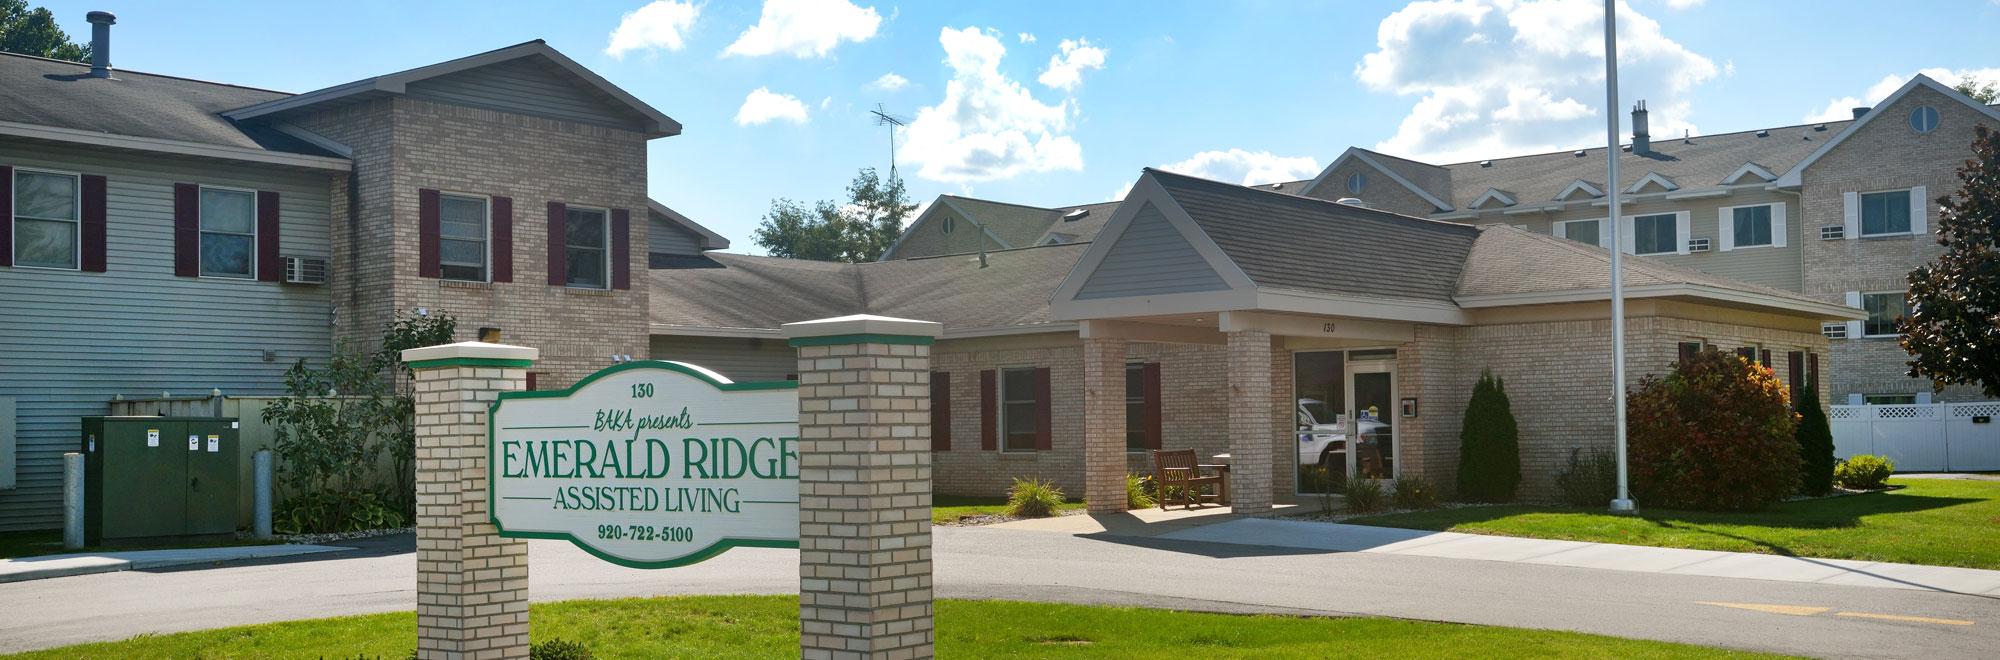 Emerald Ridge Assisted Living